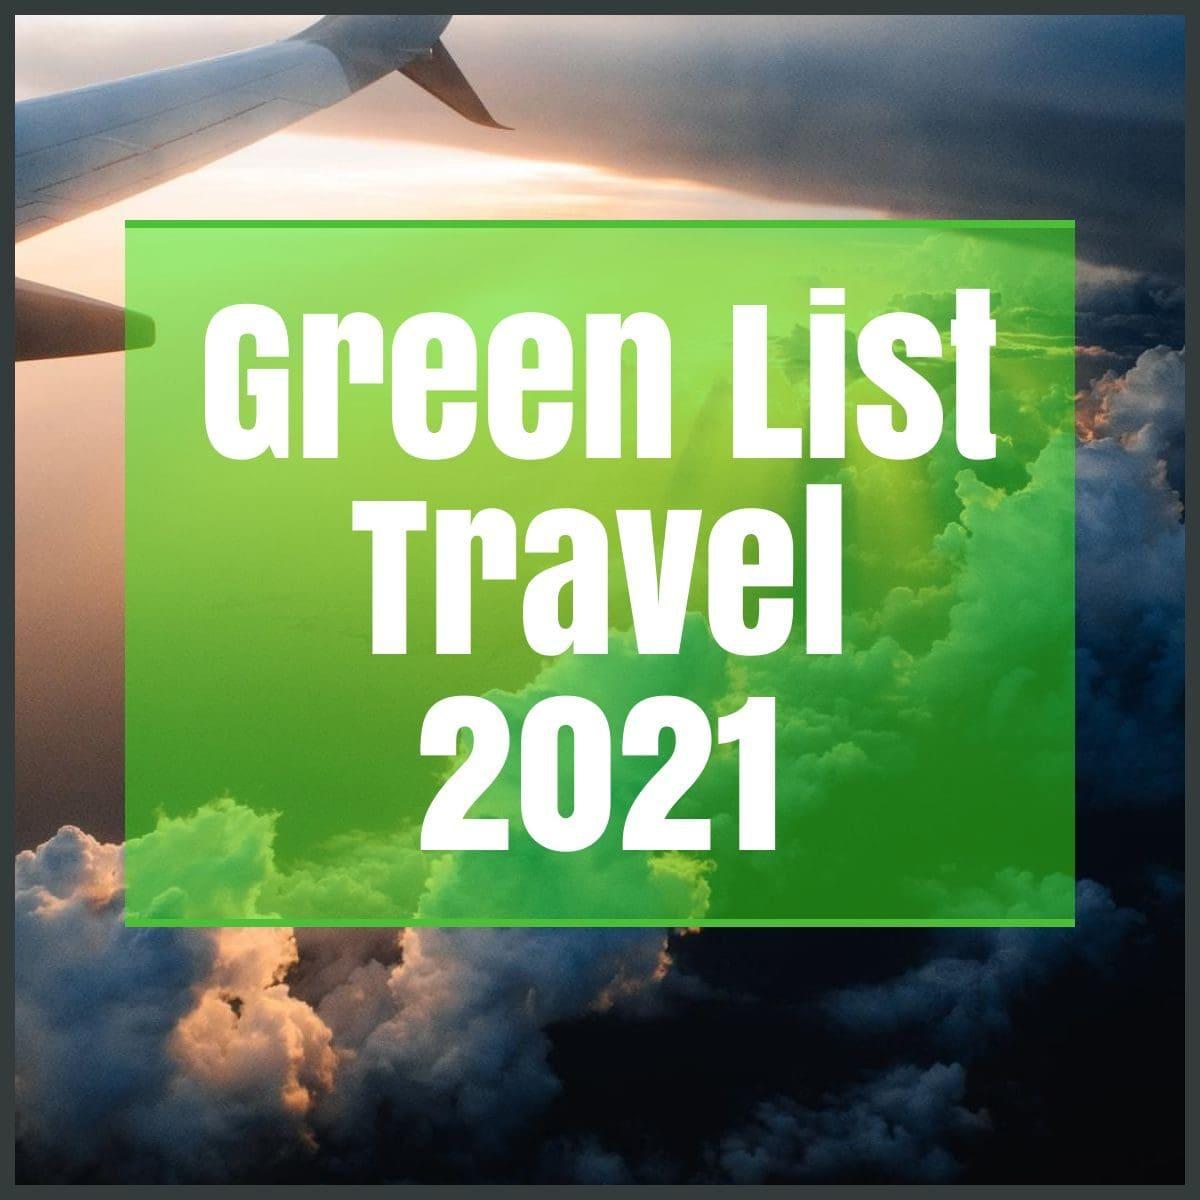 green list travel 2021 the professional traveller